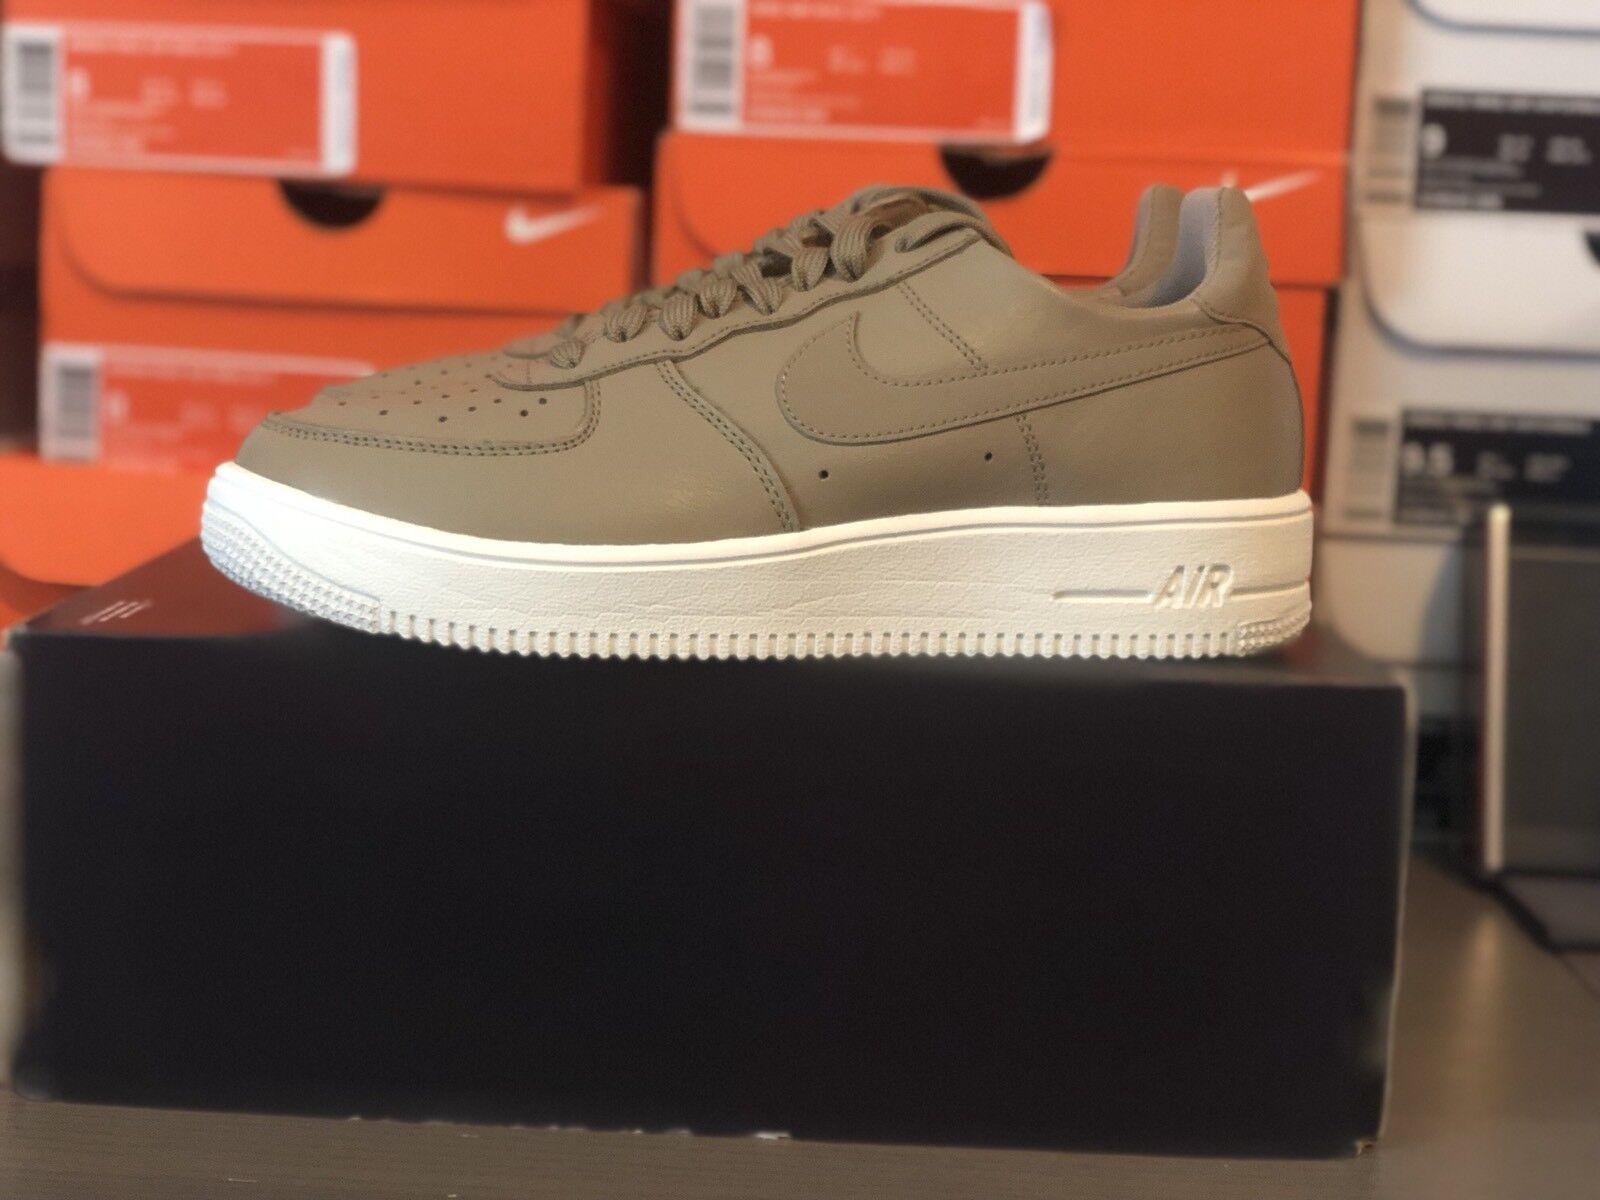 Nike Air Force 1 Ultraforce LTHR Athletic shoes SZ 7.5 Khaki  White-845052 203